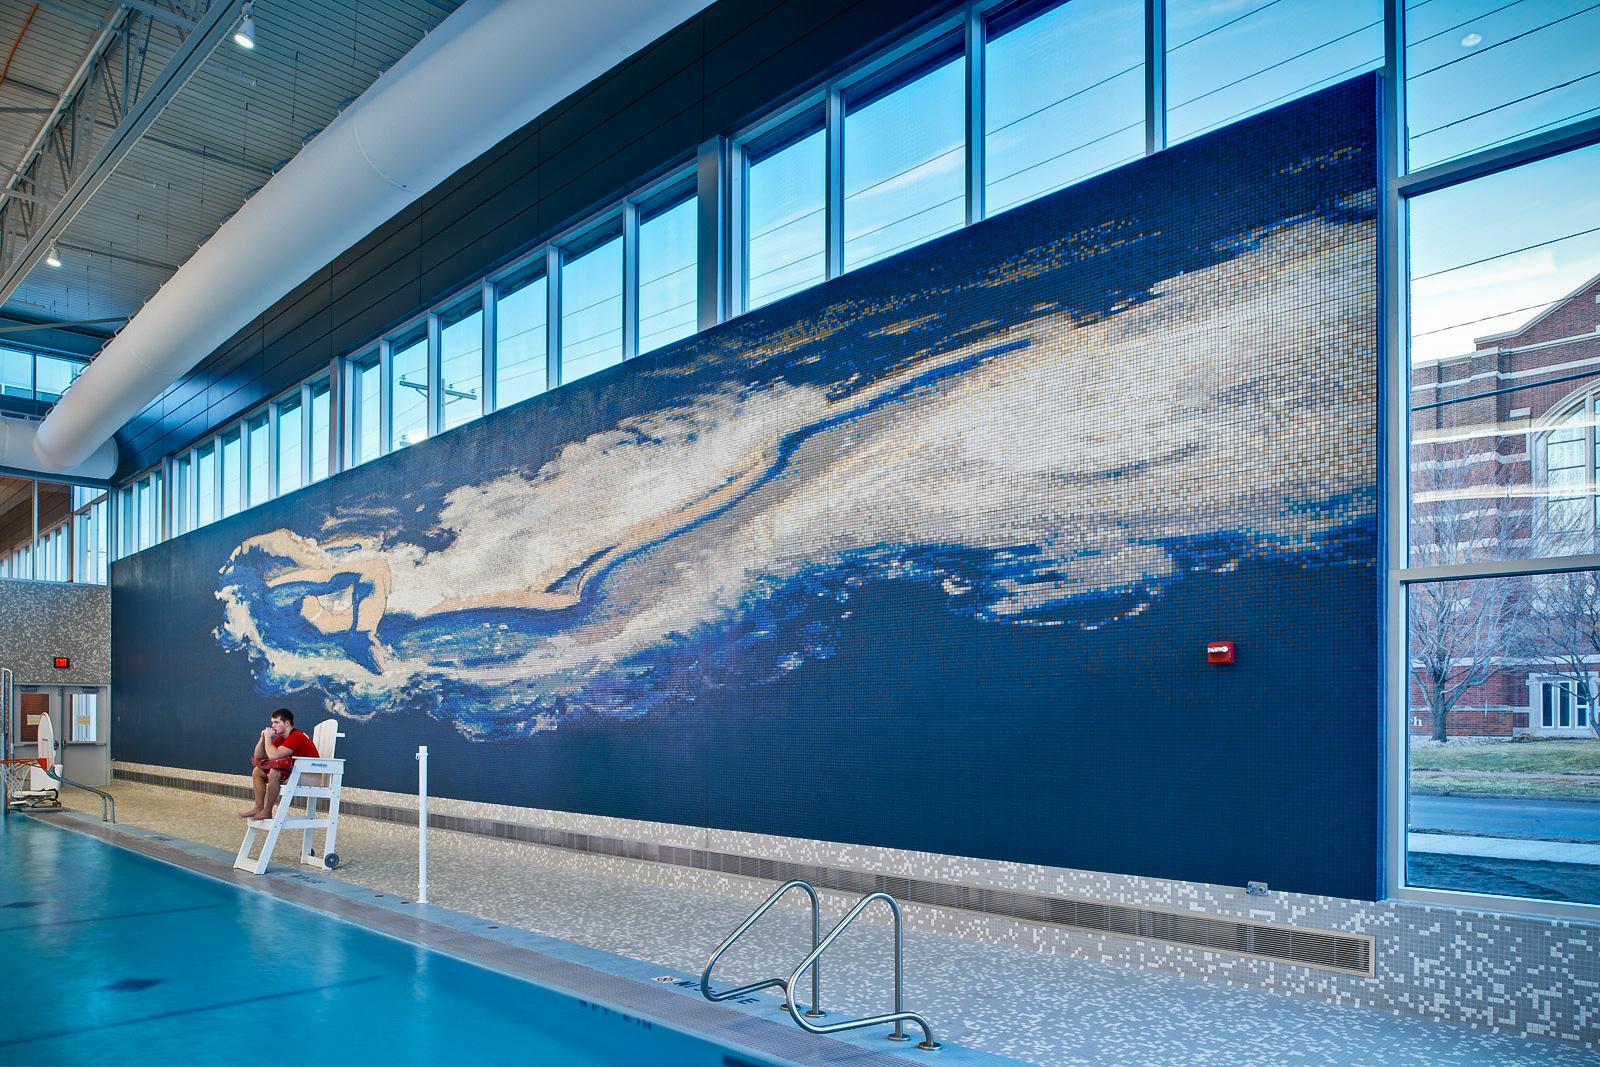 Isu Swimming Pool Custom Porcelain Mosaic Artaic